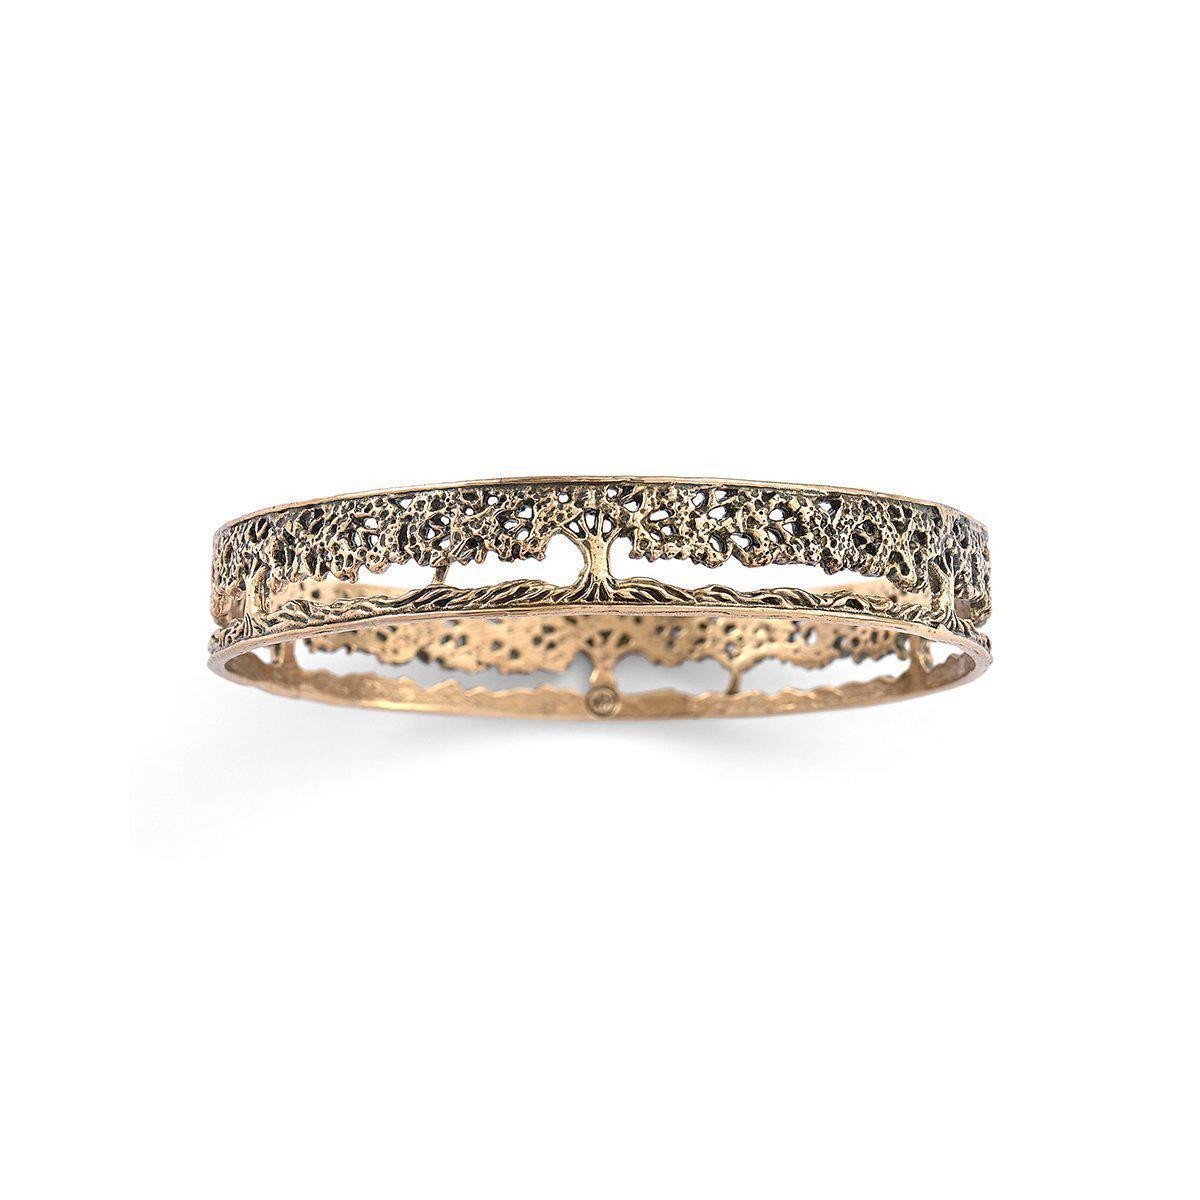 House of Alaia Tree of Life Filigree Bangle Bracelet In Bronze InB2bAS5l